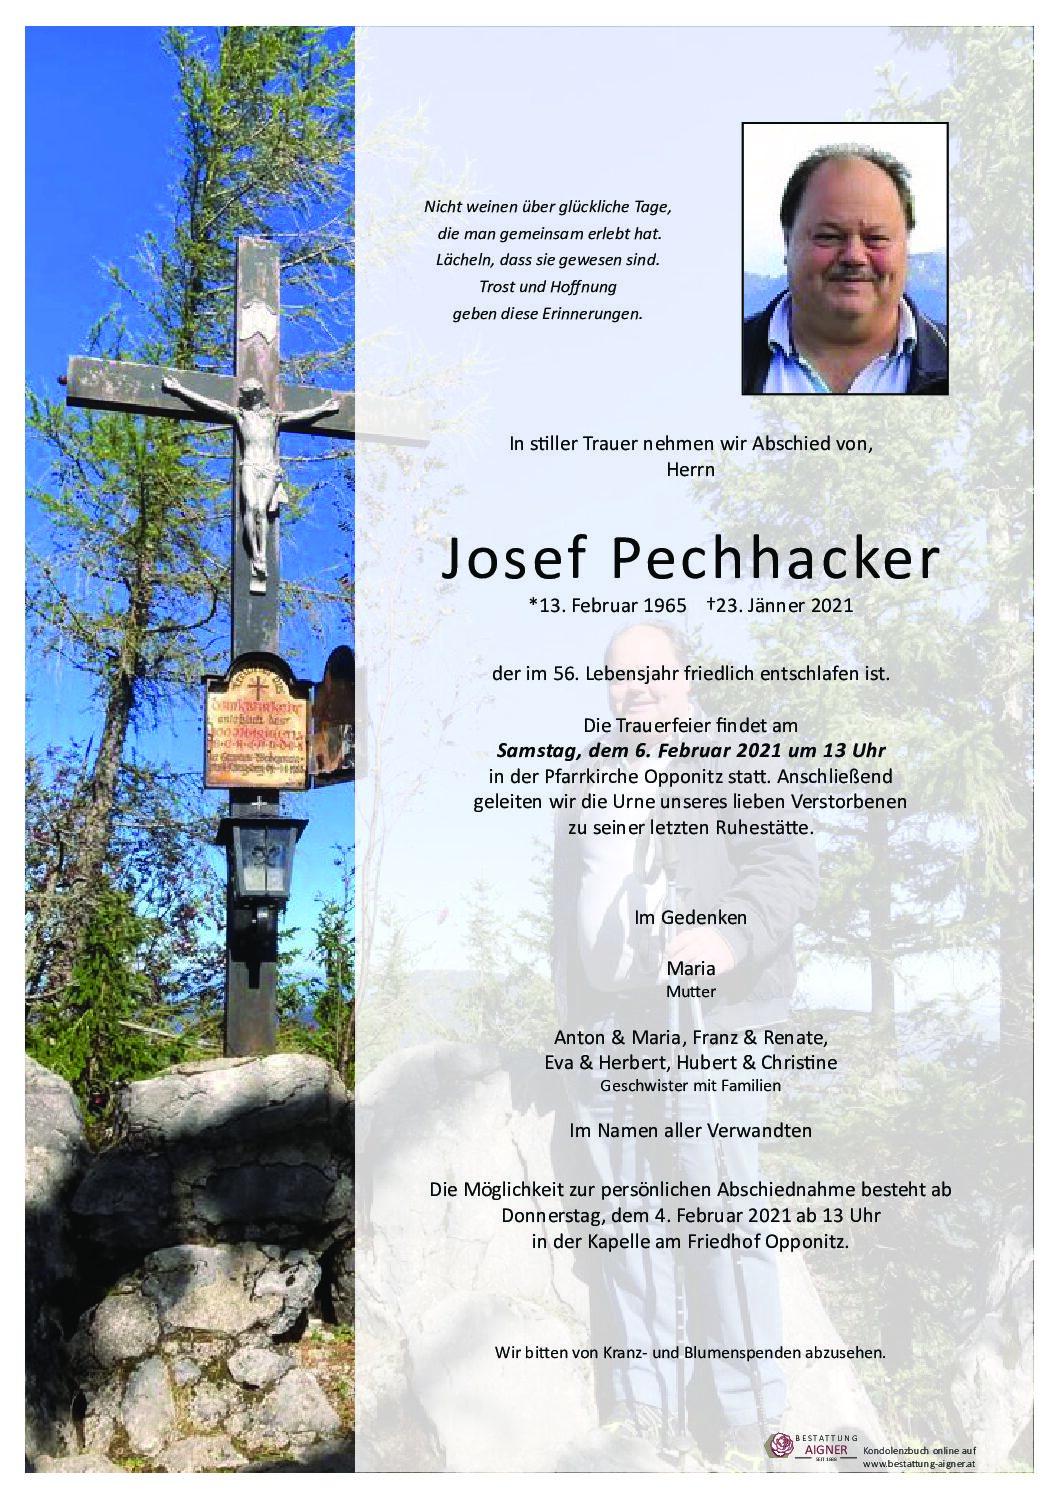 Josef Pechhacker